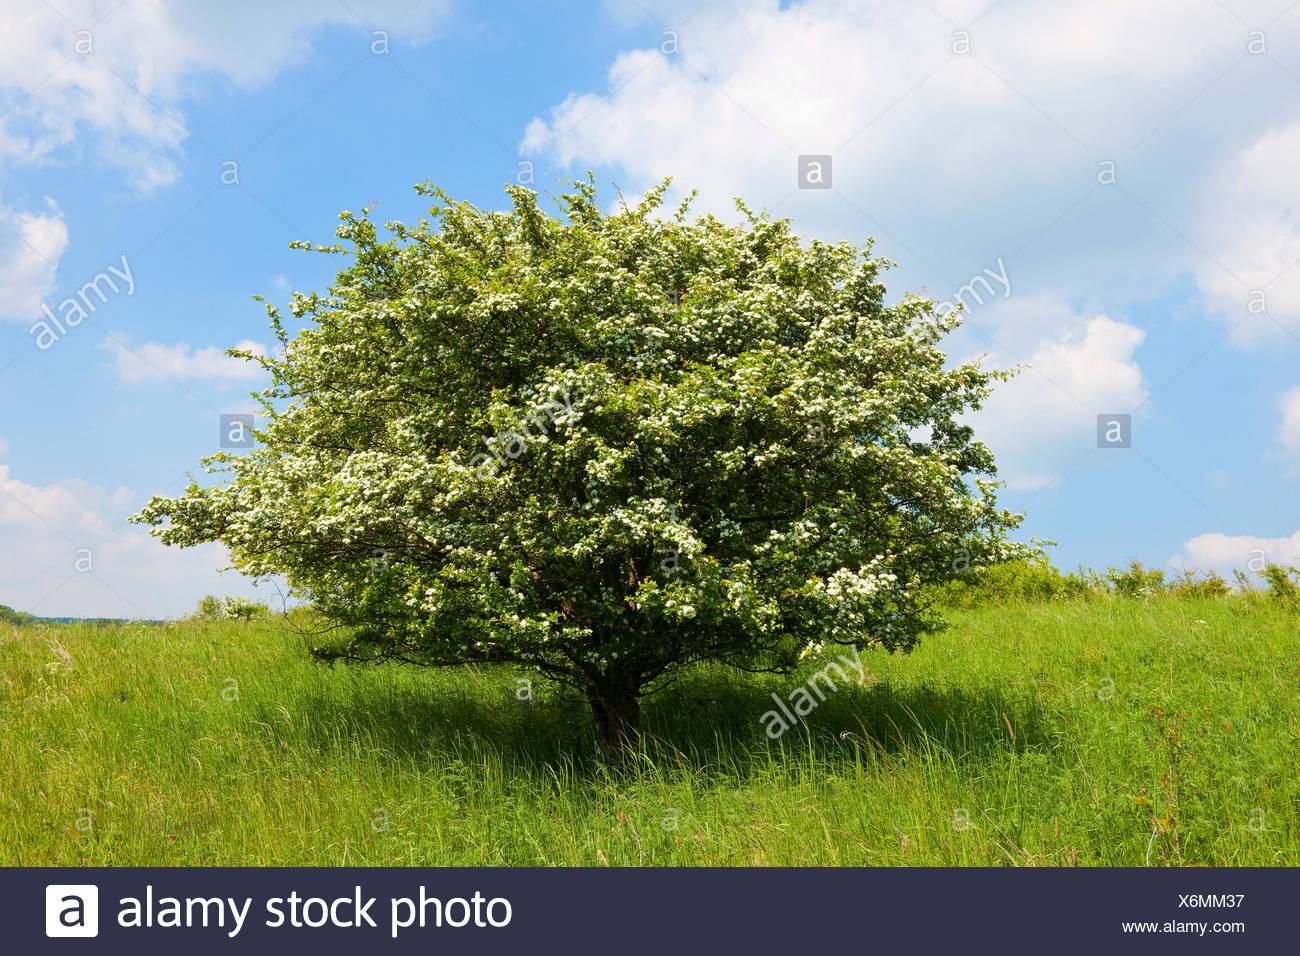 Common hawthorn (Crataegus monogyna), solitary tree, flowering, Thuringia, Germany - Stock Image